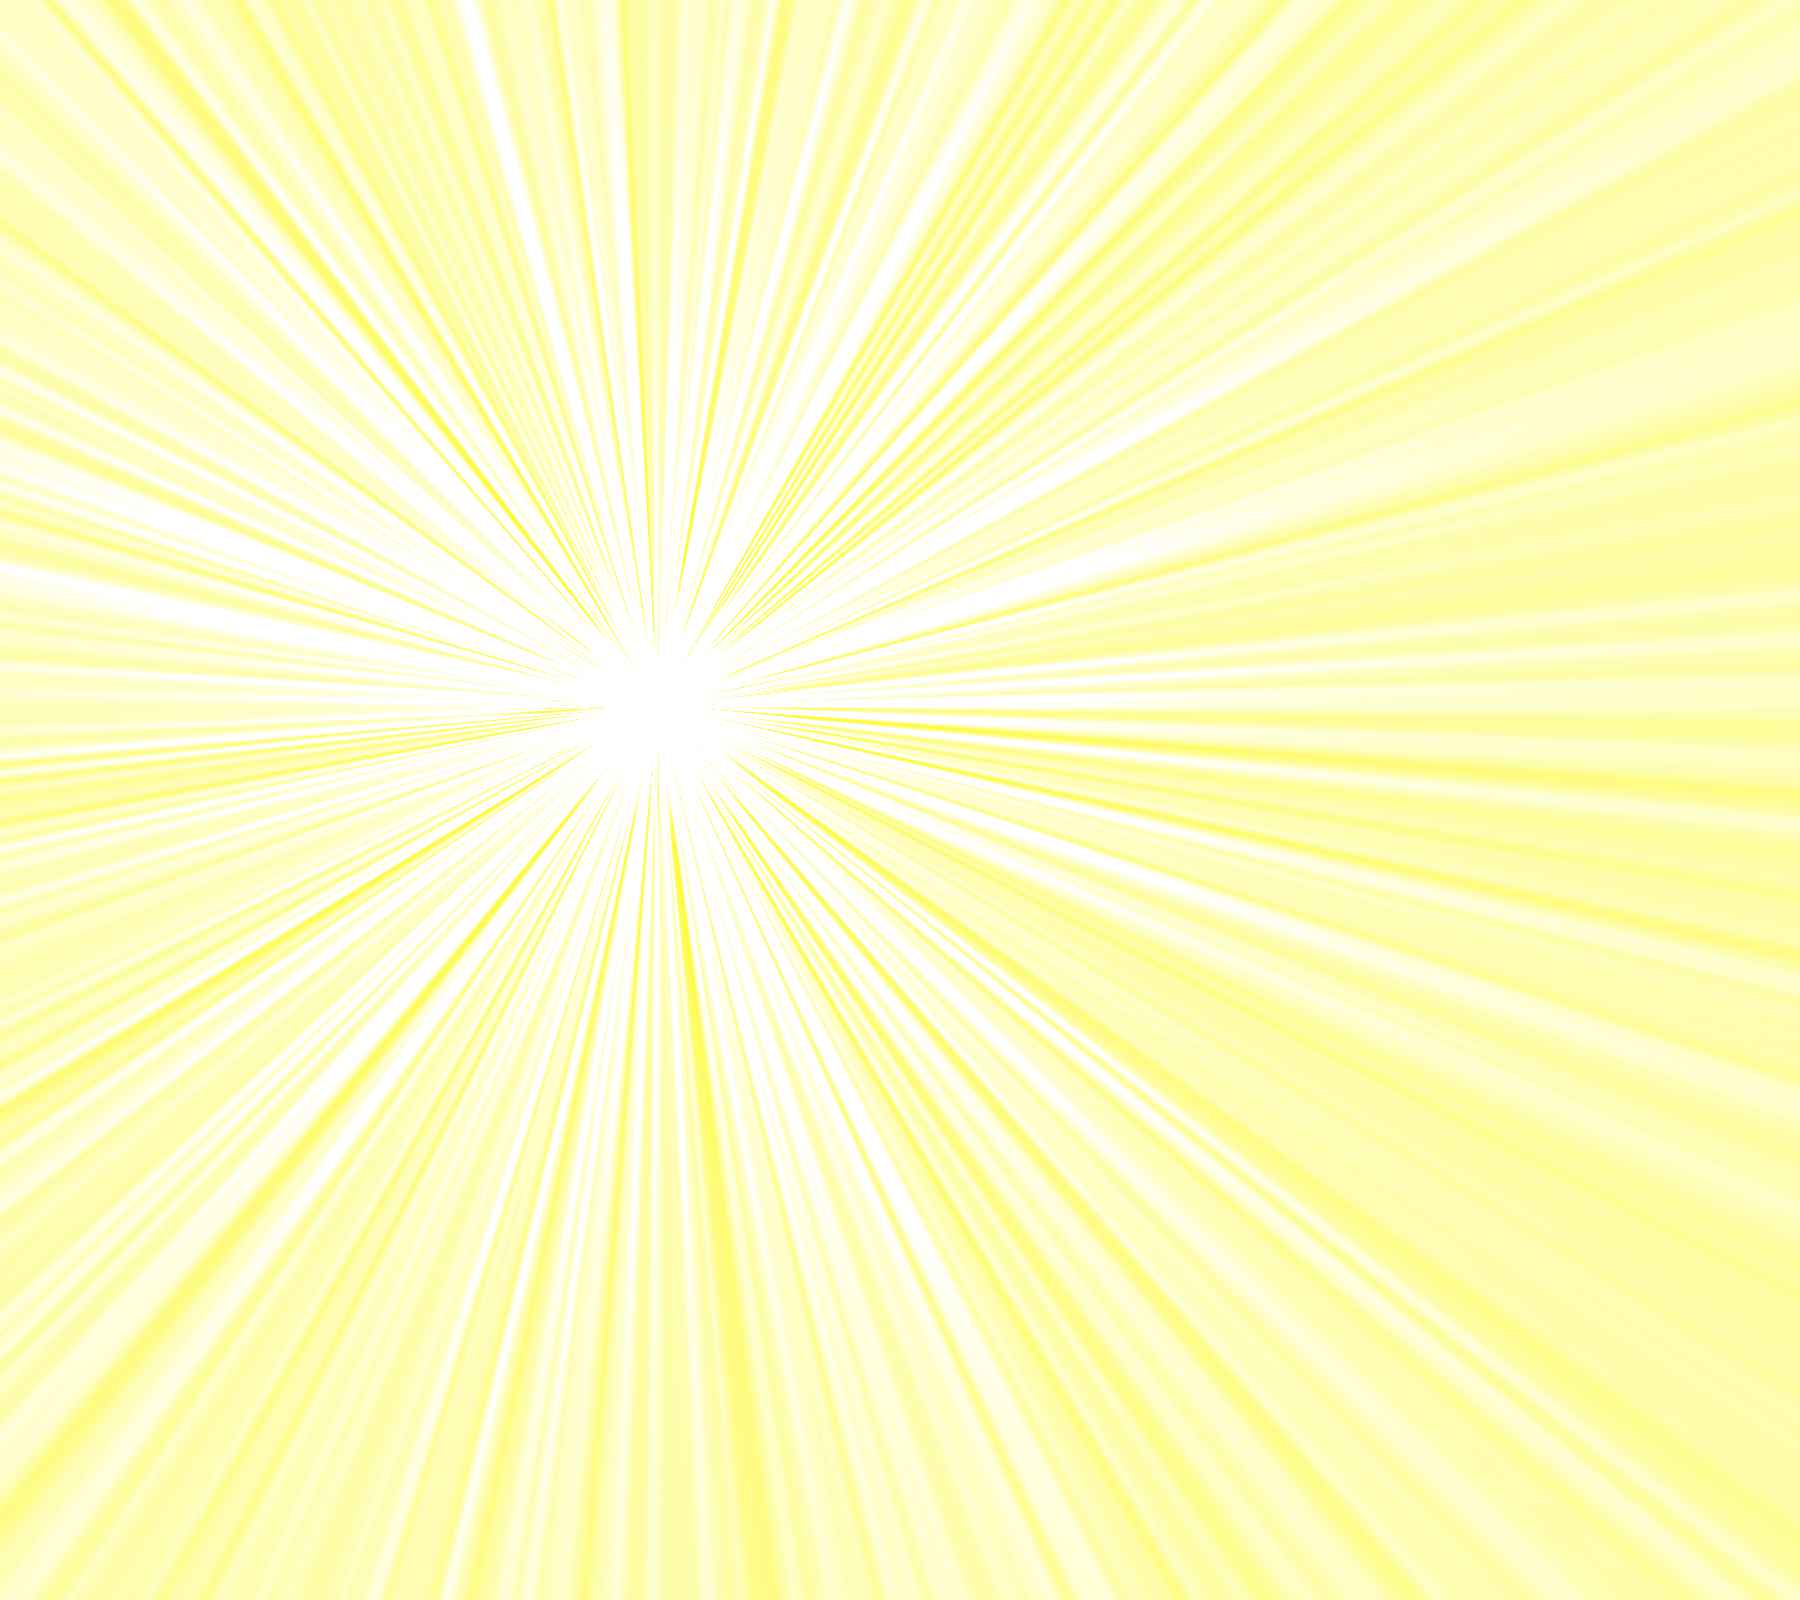 light_yellow_starburst_radiating_lines_background_1800x1600